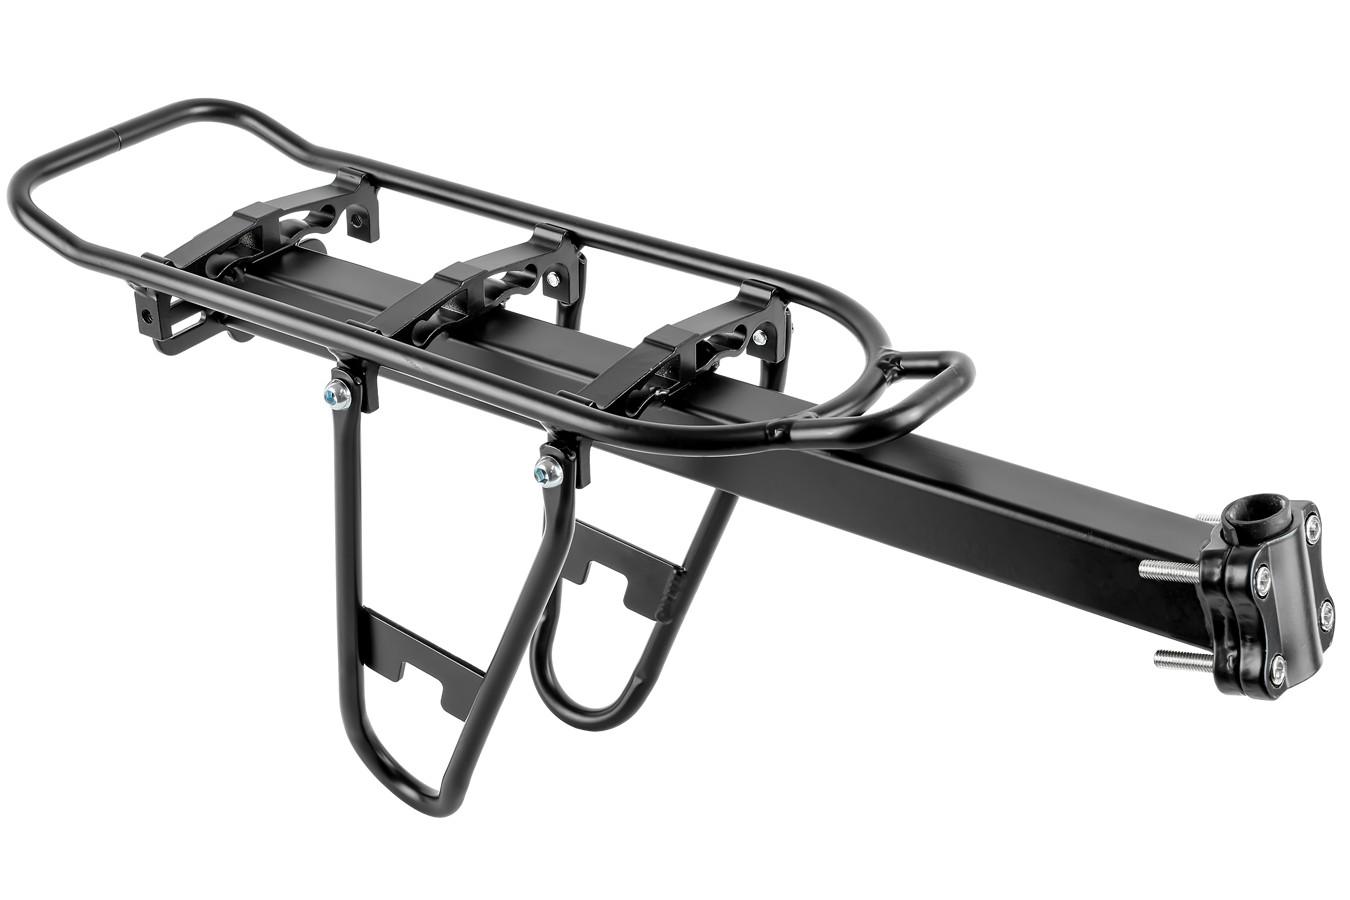 Bagageiro Bicicleta Alumínio Para Canote de Selim 700 HL-AL15 - Saicg